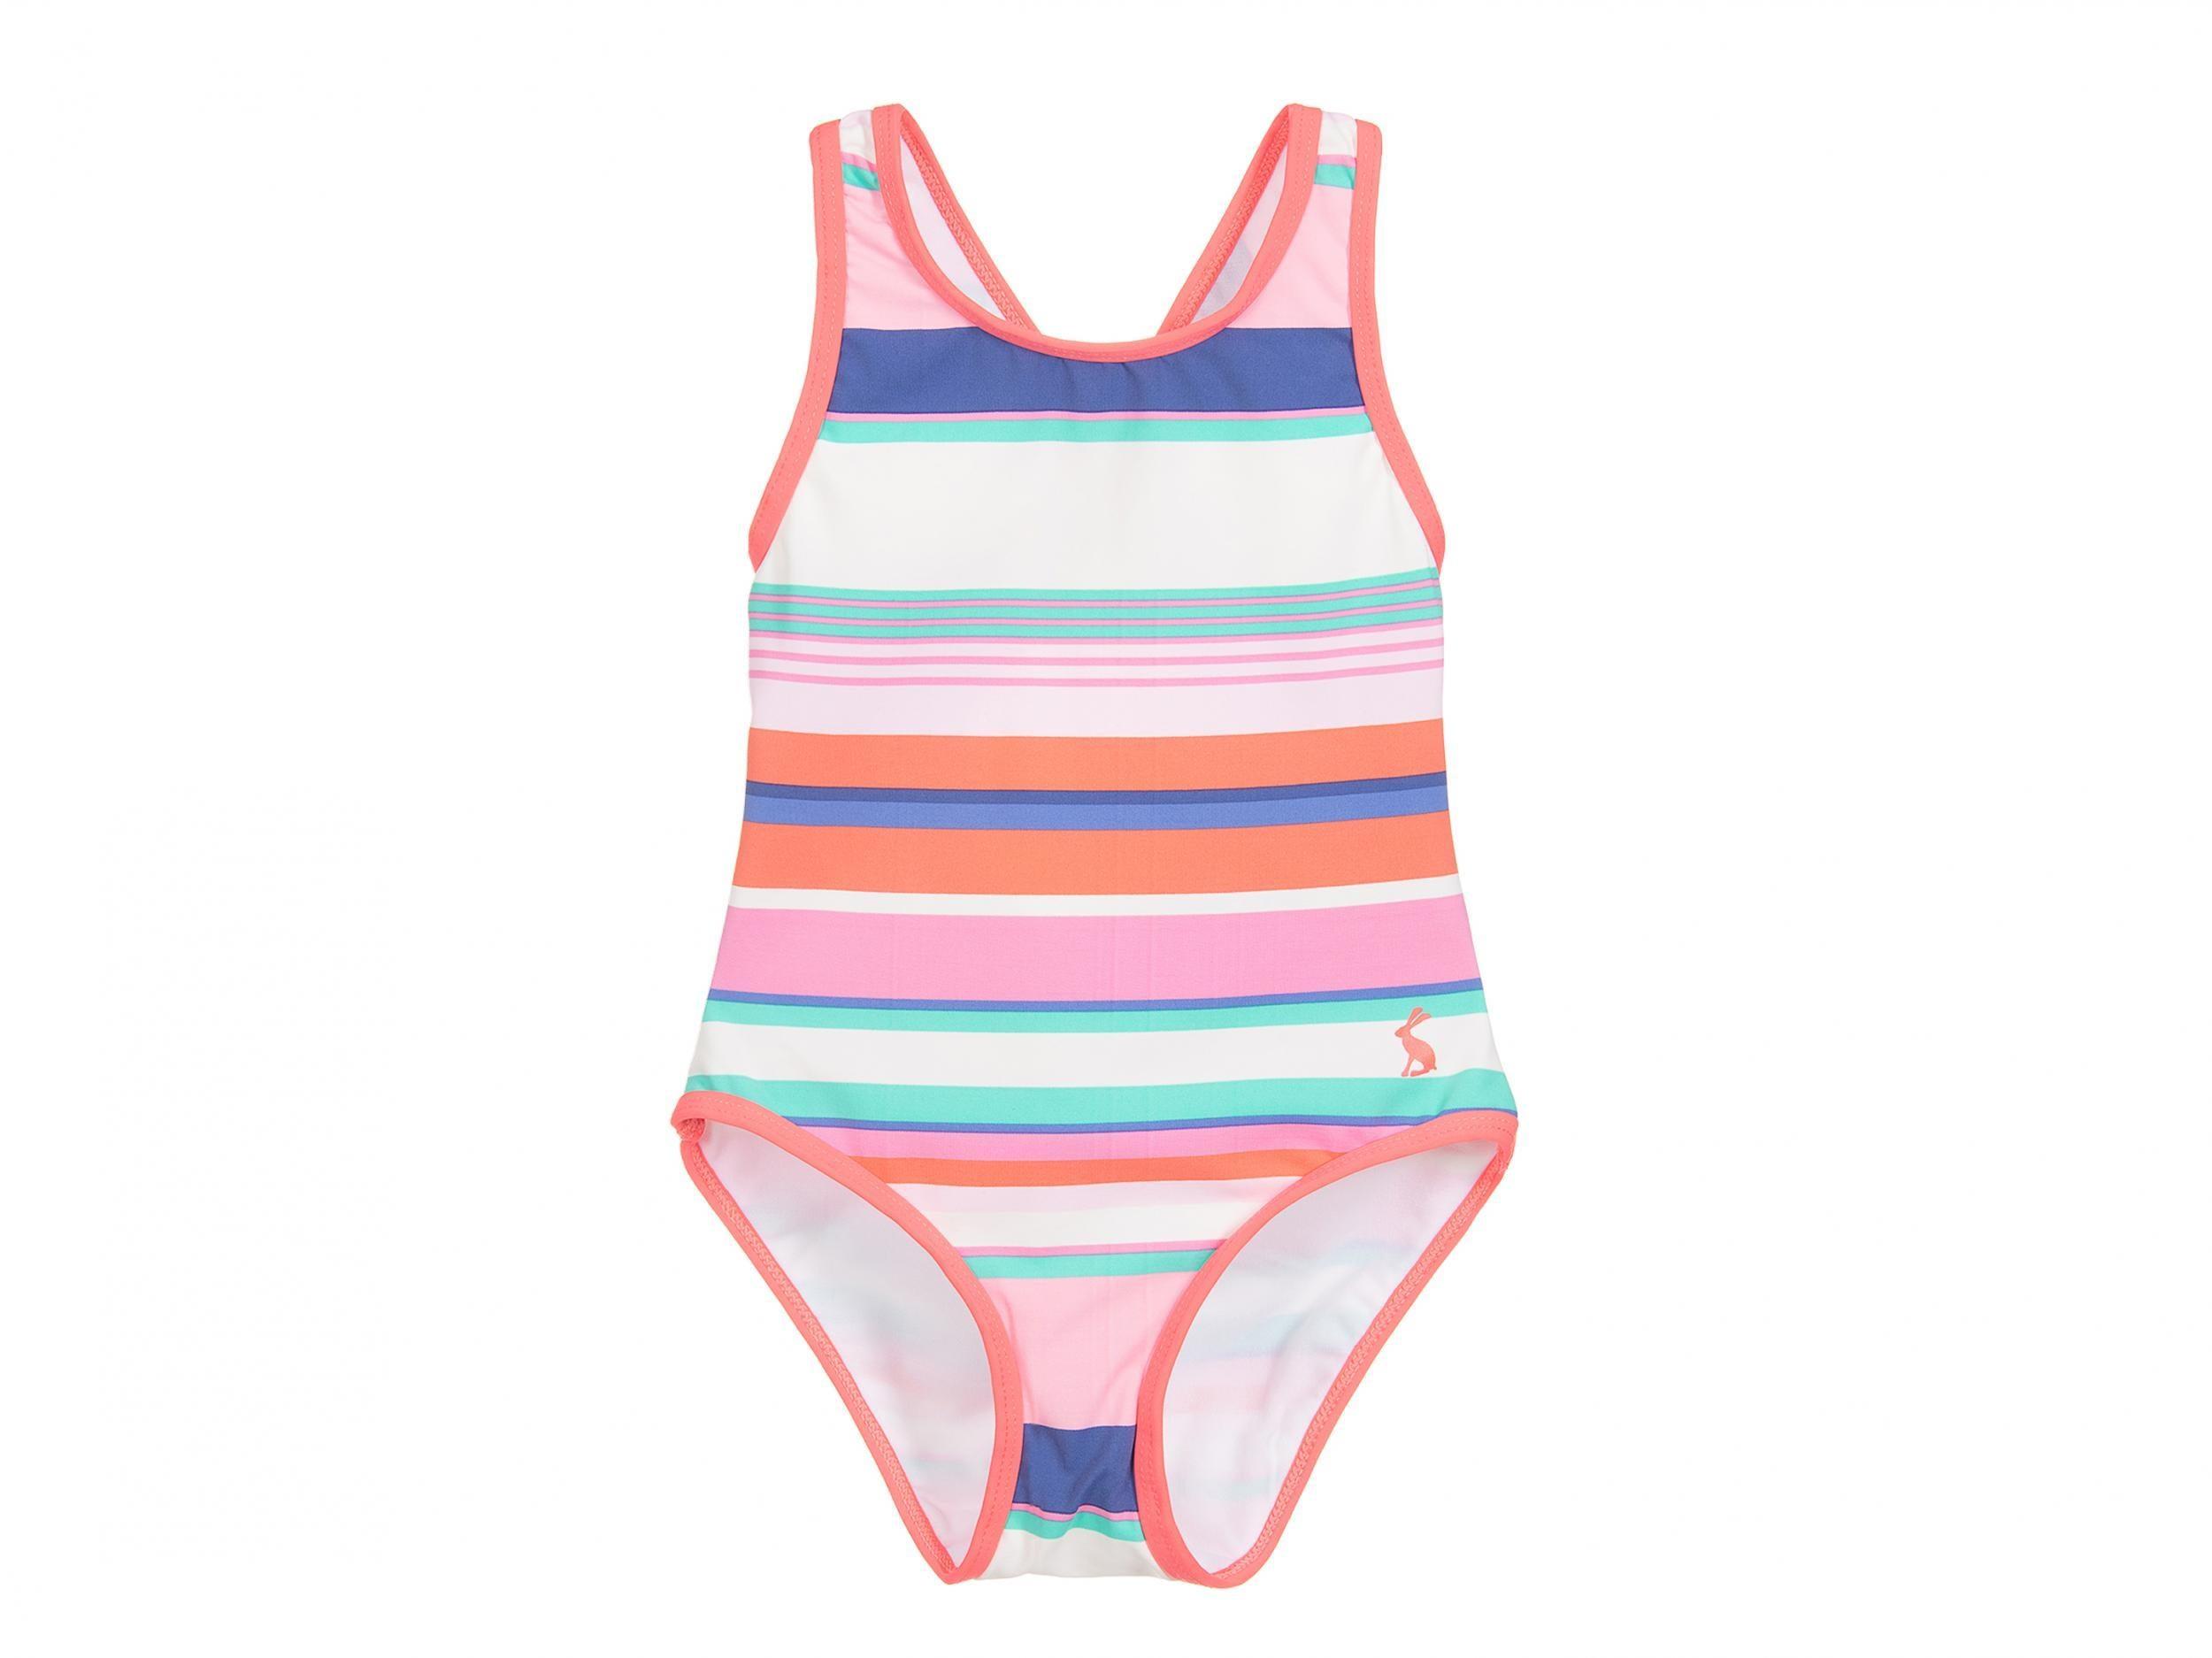 Kids Summer Swimwear one piece Swimming Costume Boys Sunsafe Surf jumpsuit